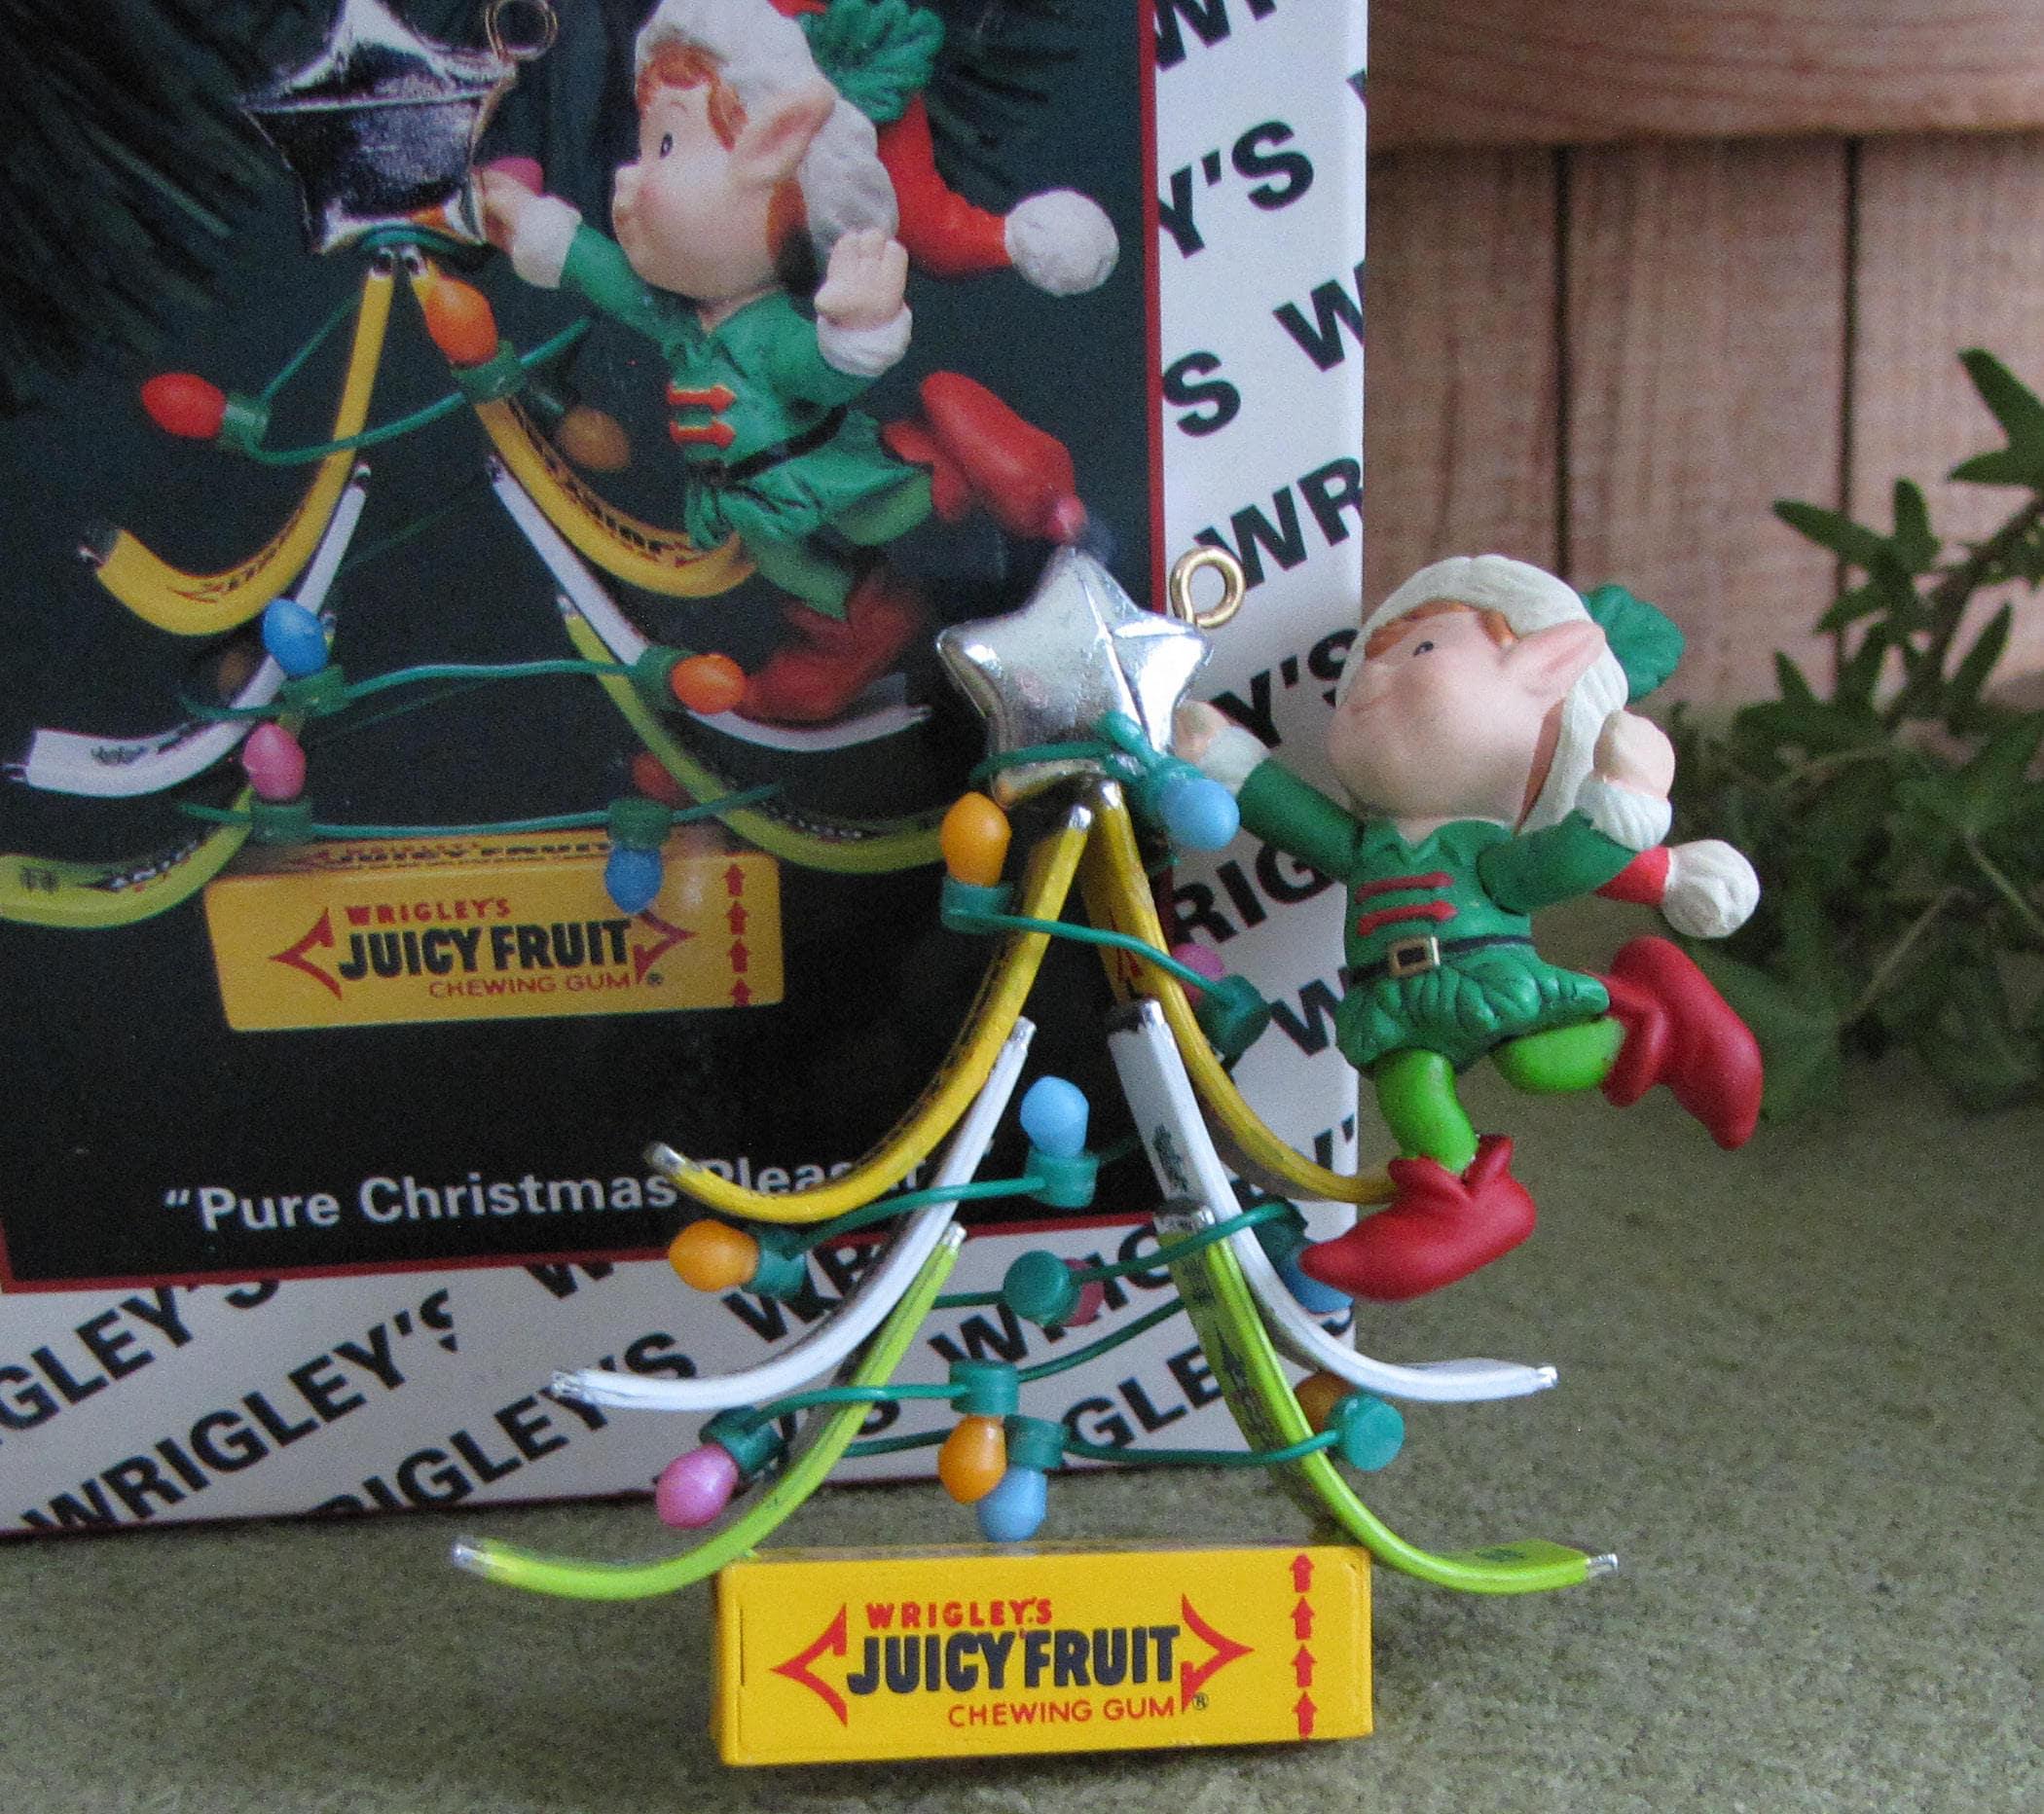 ENESCO 1994 WRIGLEY/'S PURE CHRISTMAS PLEASURE ORNAMENT